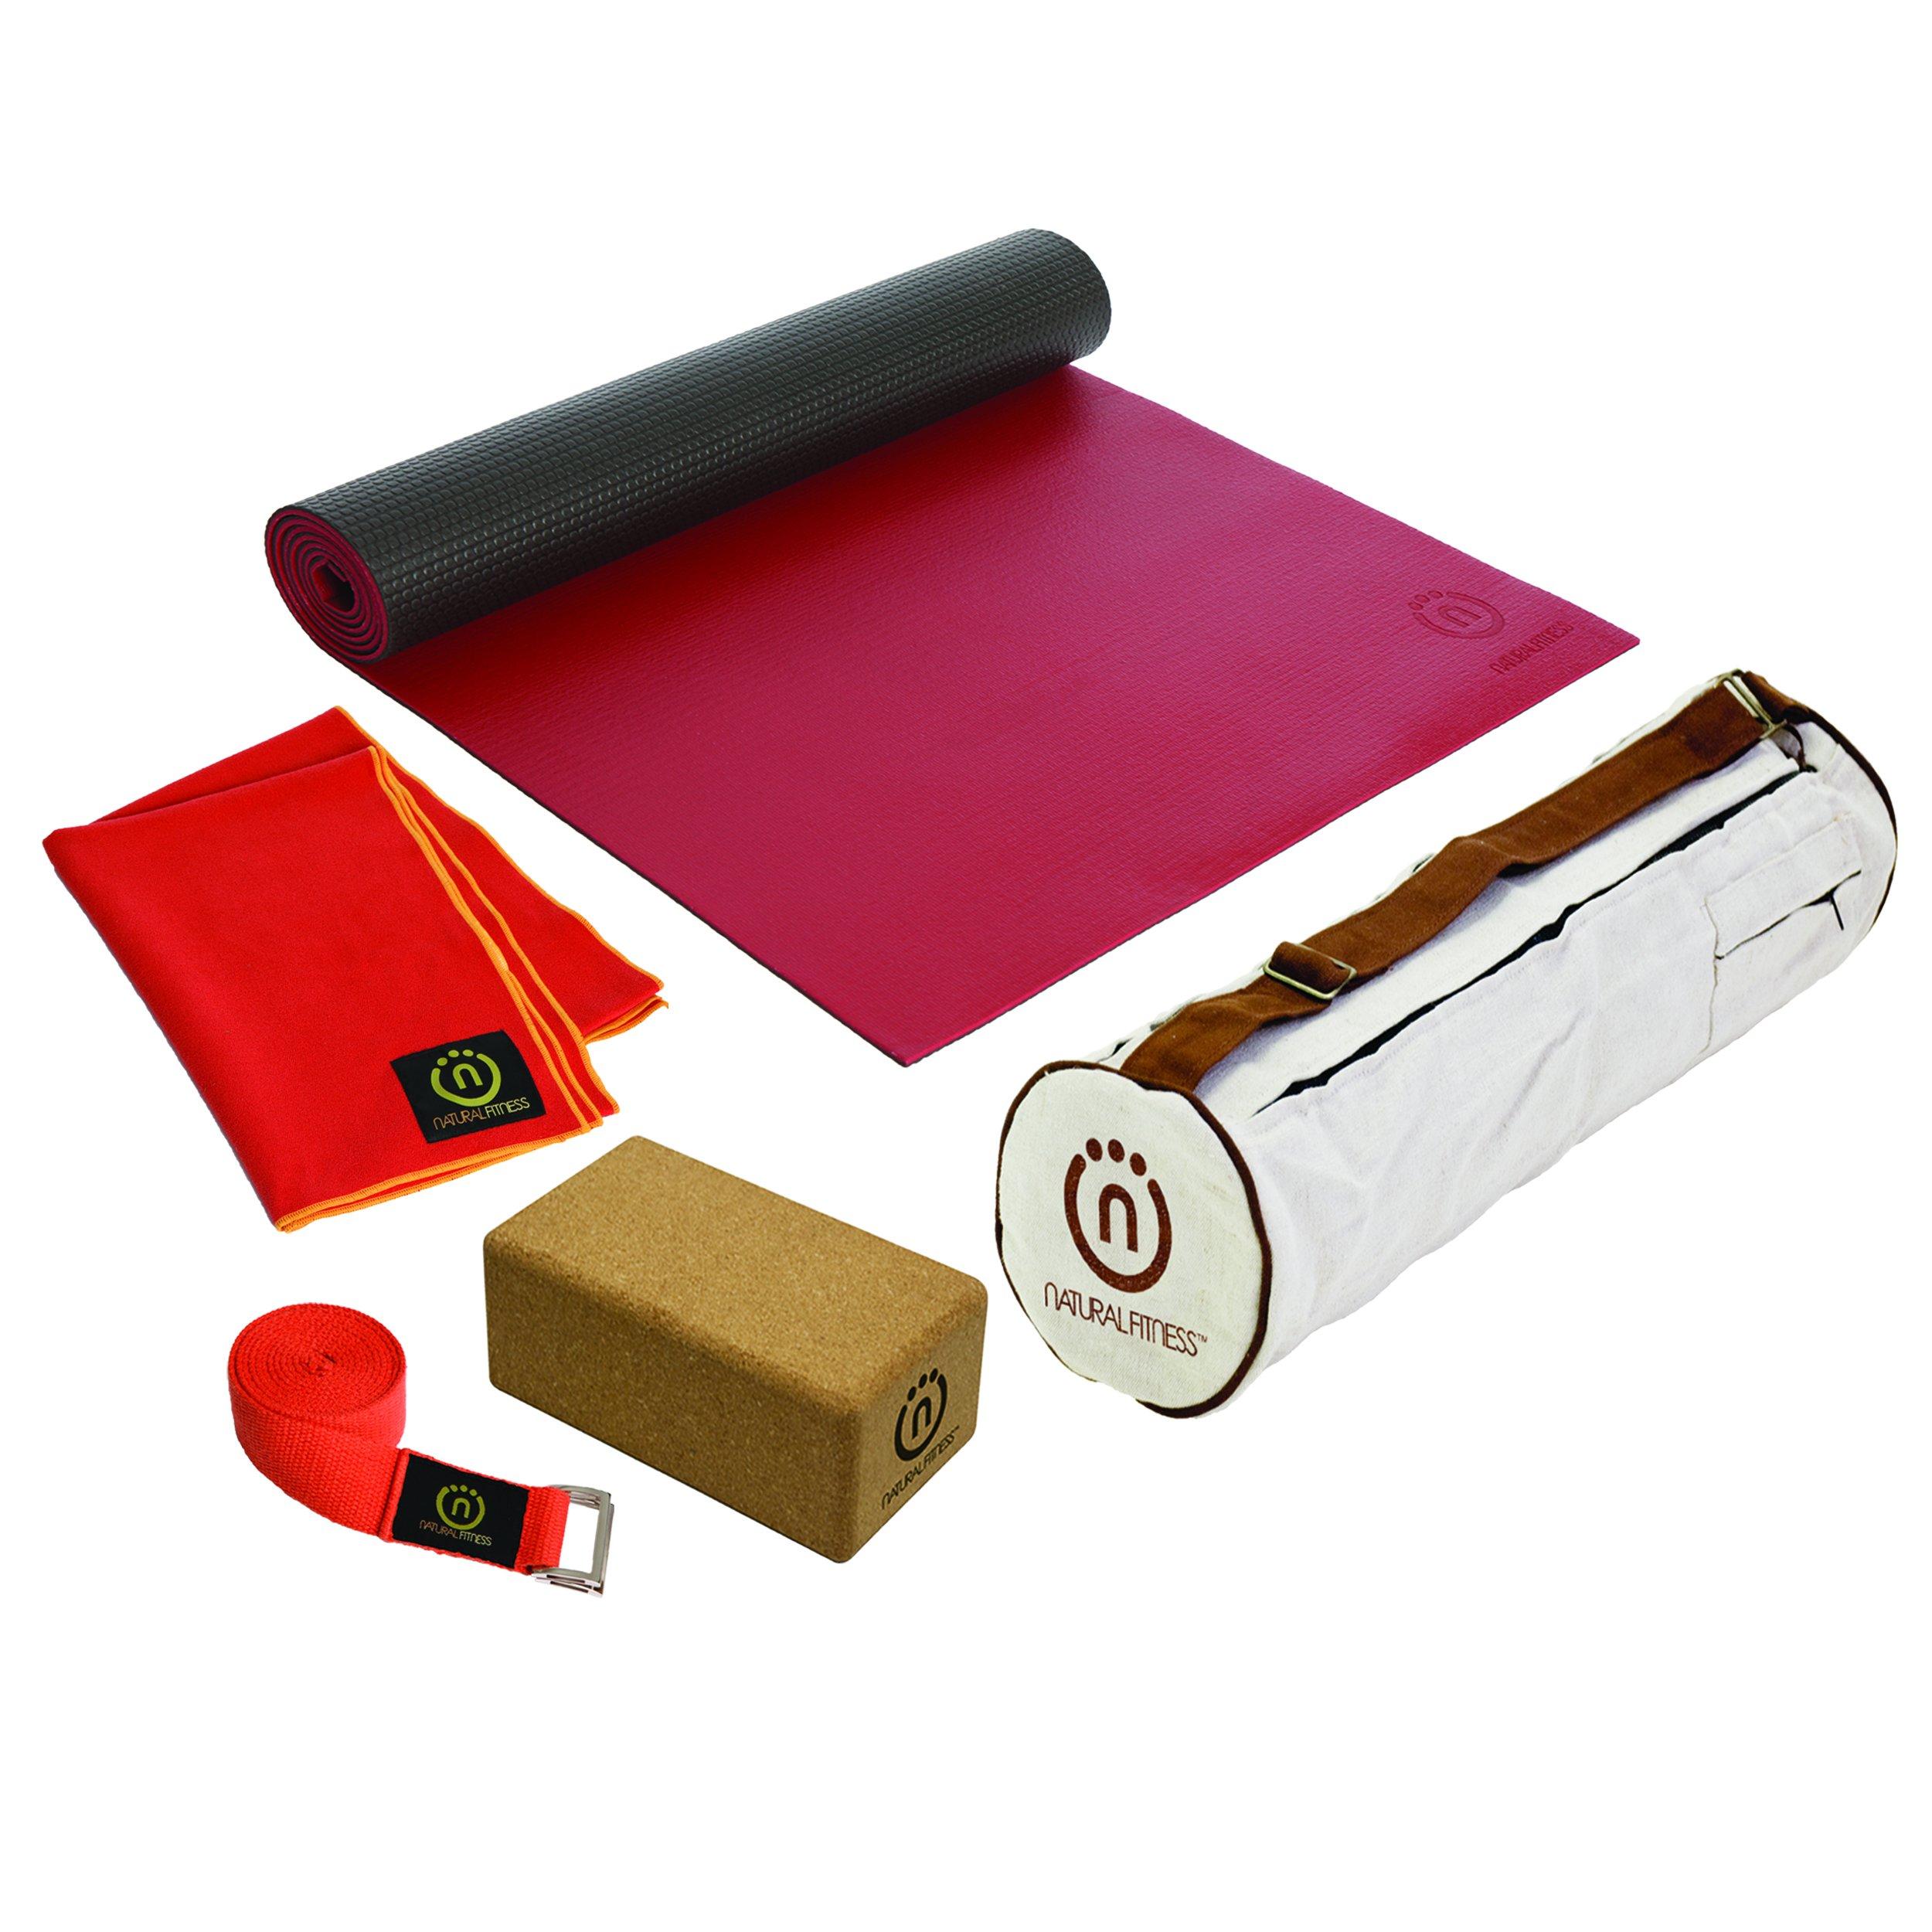 Hot Yoga Kit (Warrior Mat, Towel, Cork Block, Hemp Strap) One Size by Natural Fitness